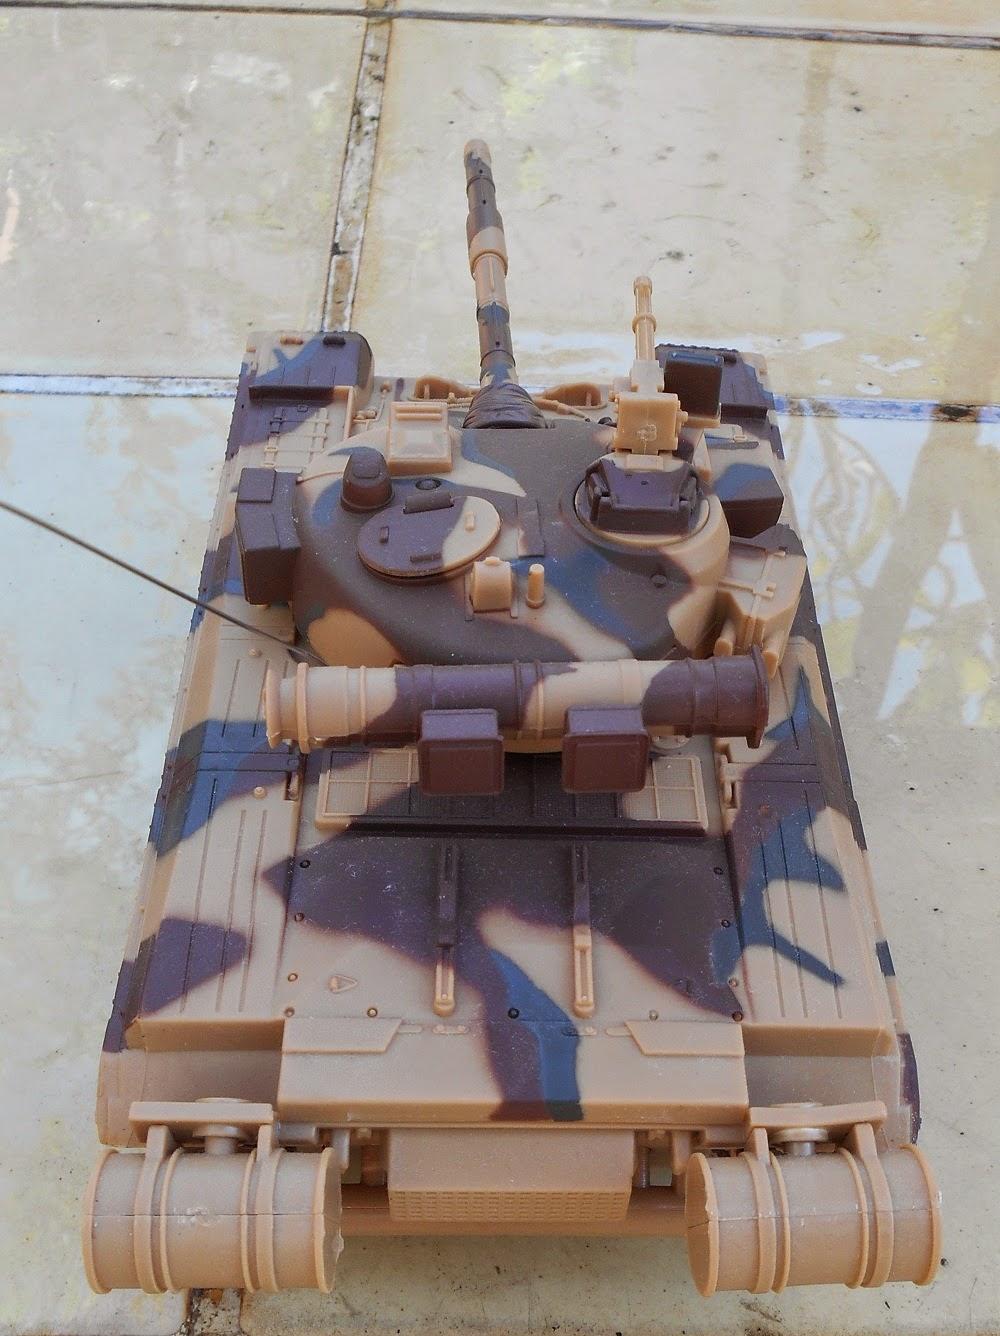 maqueta de carro de combate 1:32